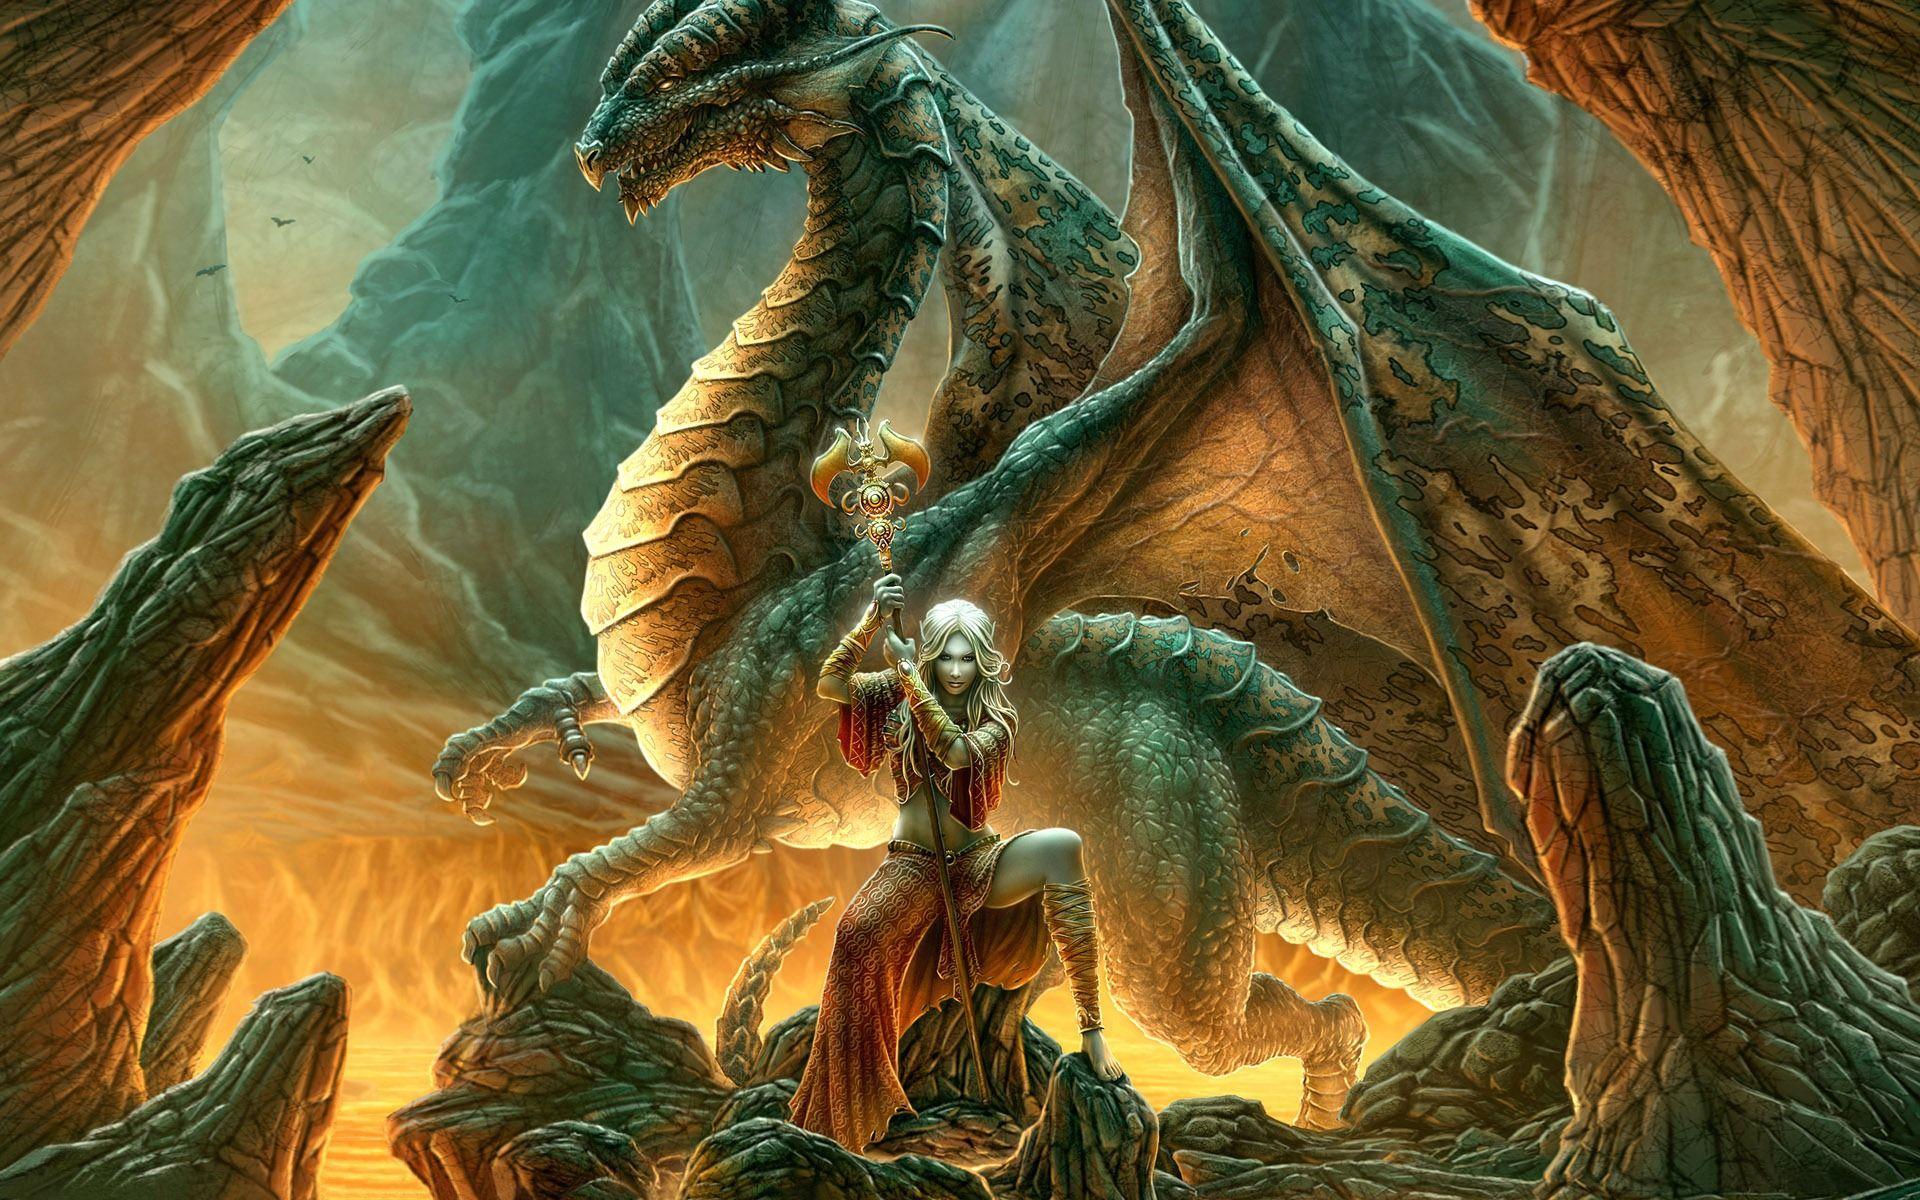 real looking dragons | download beautiful dragon wallpapers high